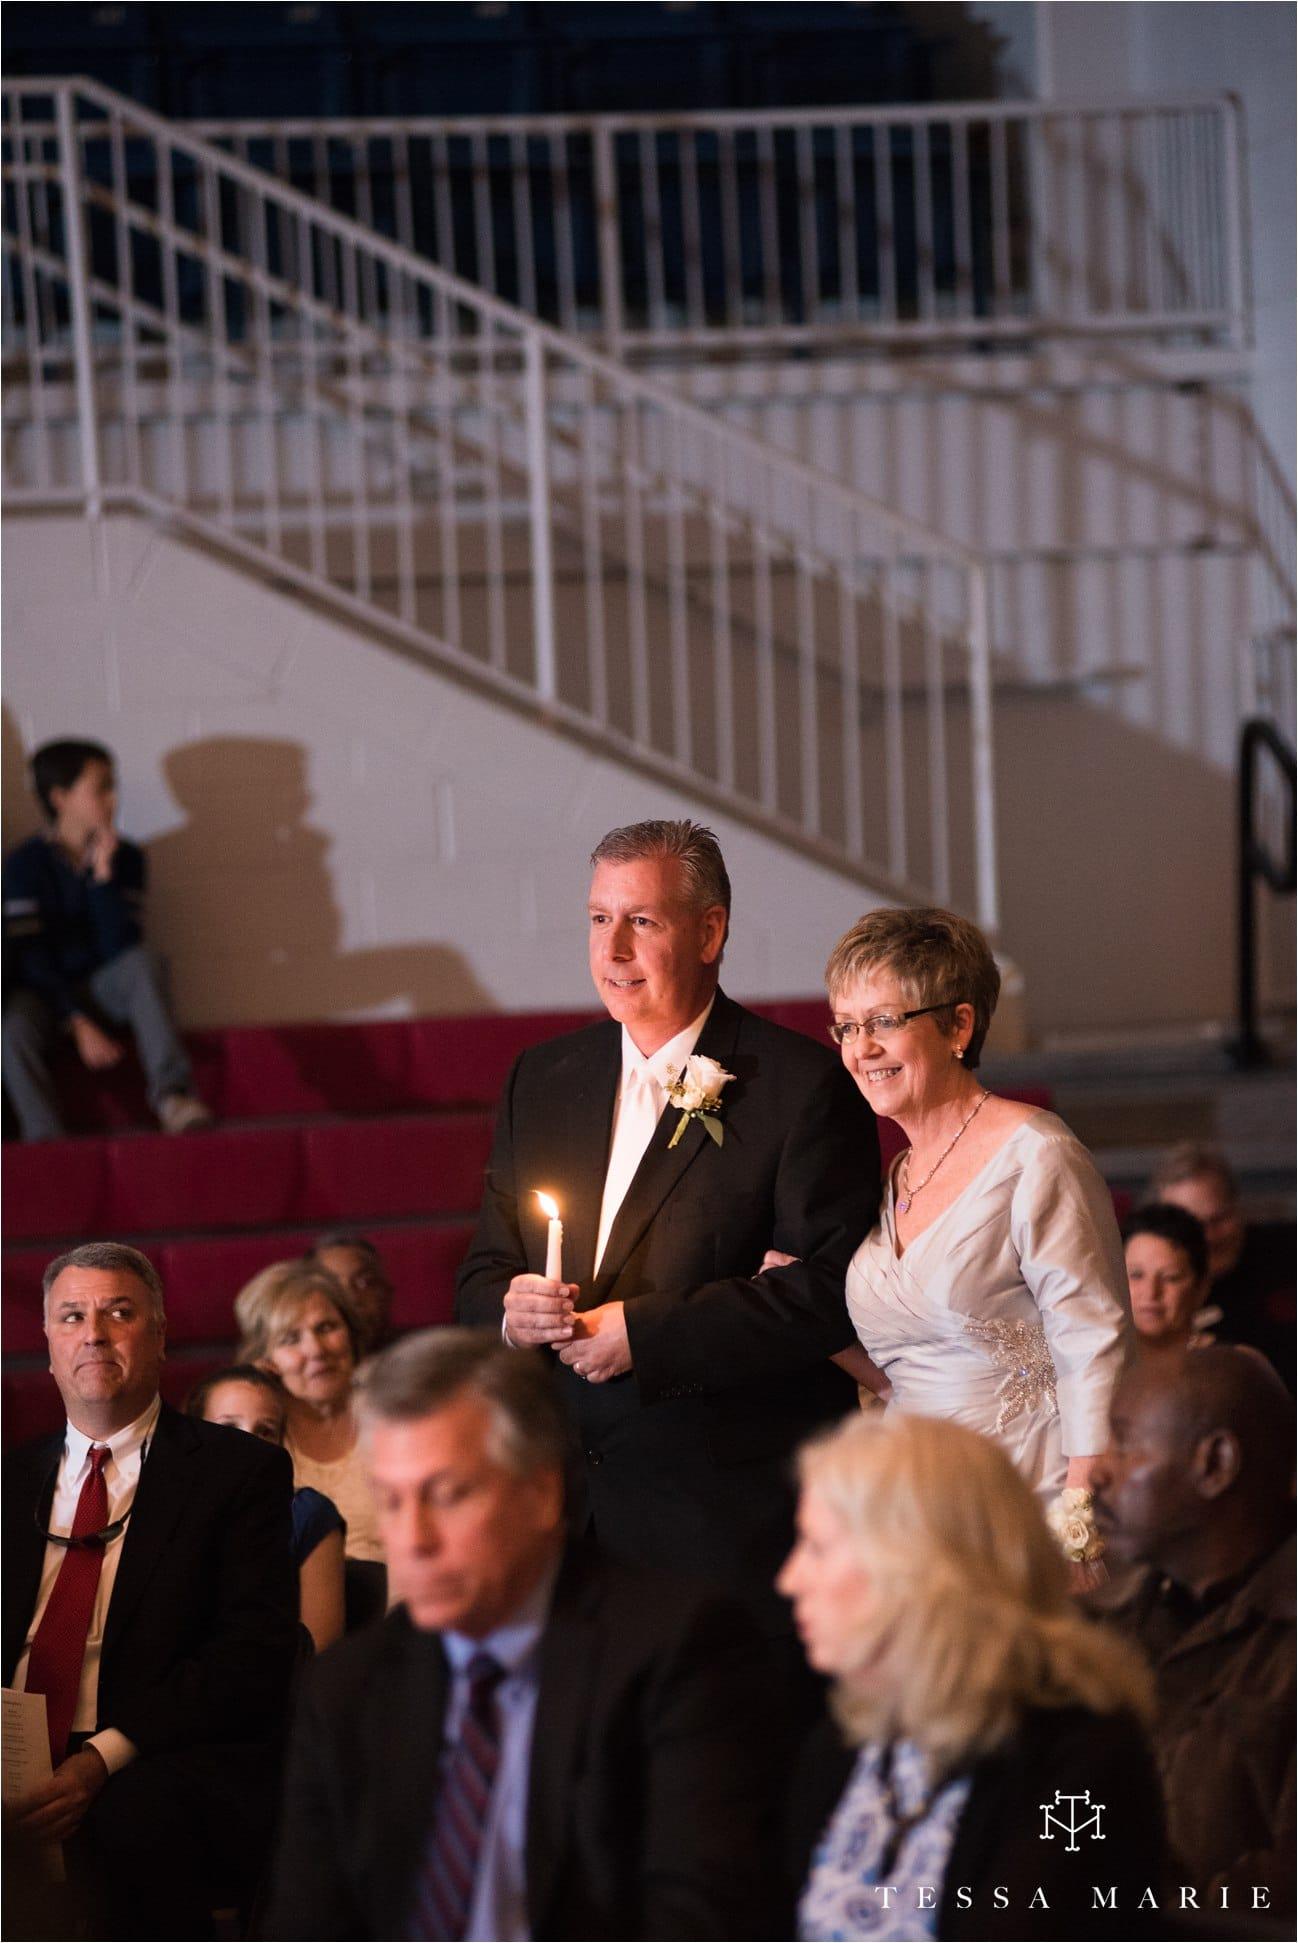 tessa_marie_weddings_wedding_moments_Tessa_marie_studios_0086